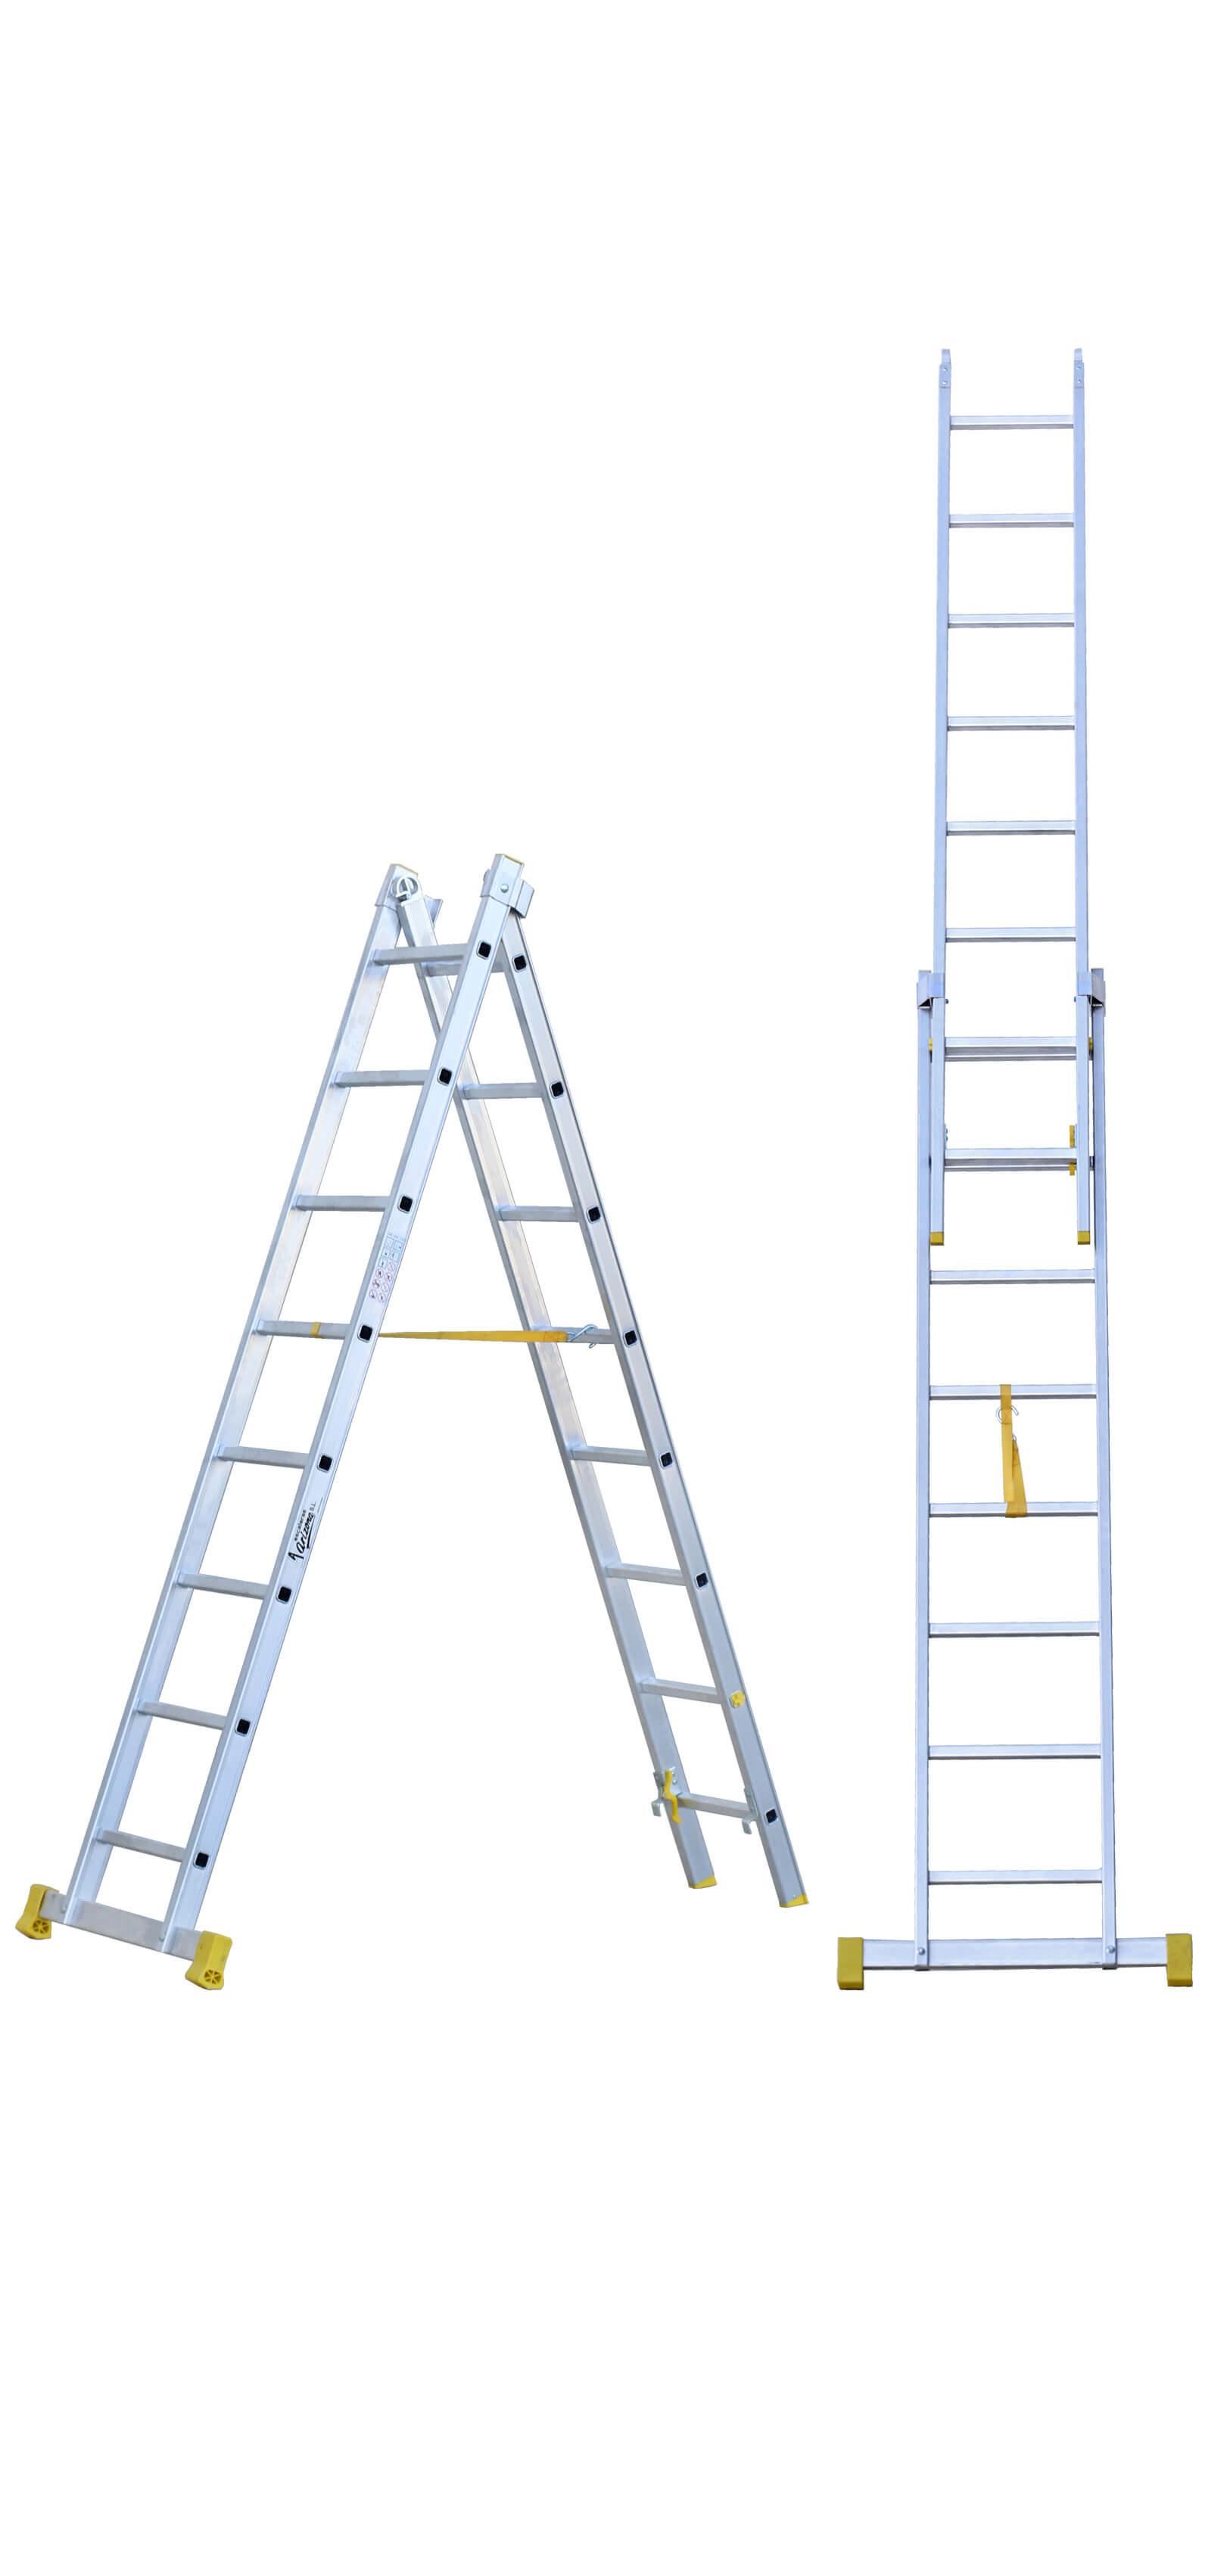 Escalera de aluminio transformable de 2 tramos escaleras for Escalera madera 2 tramos